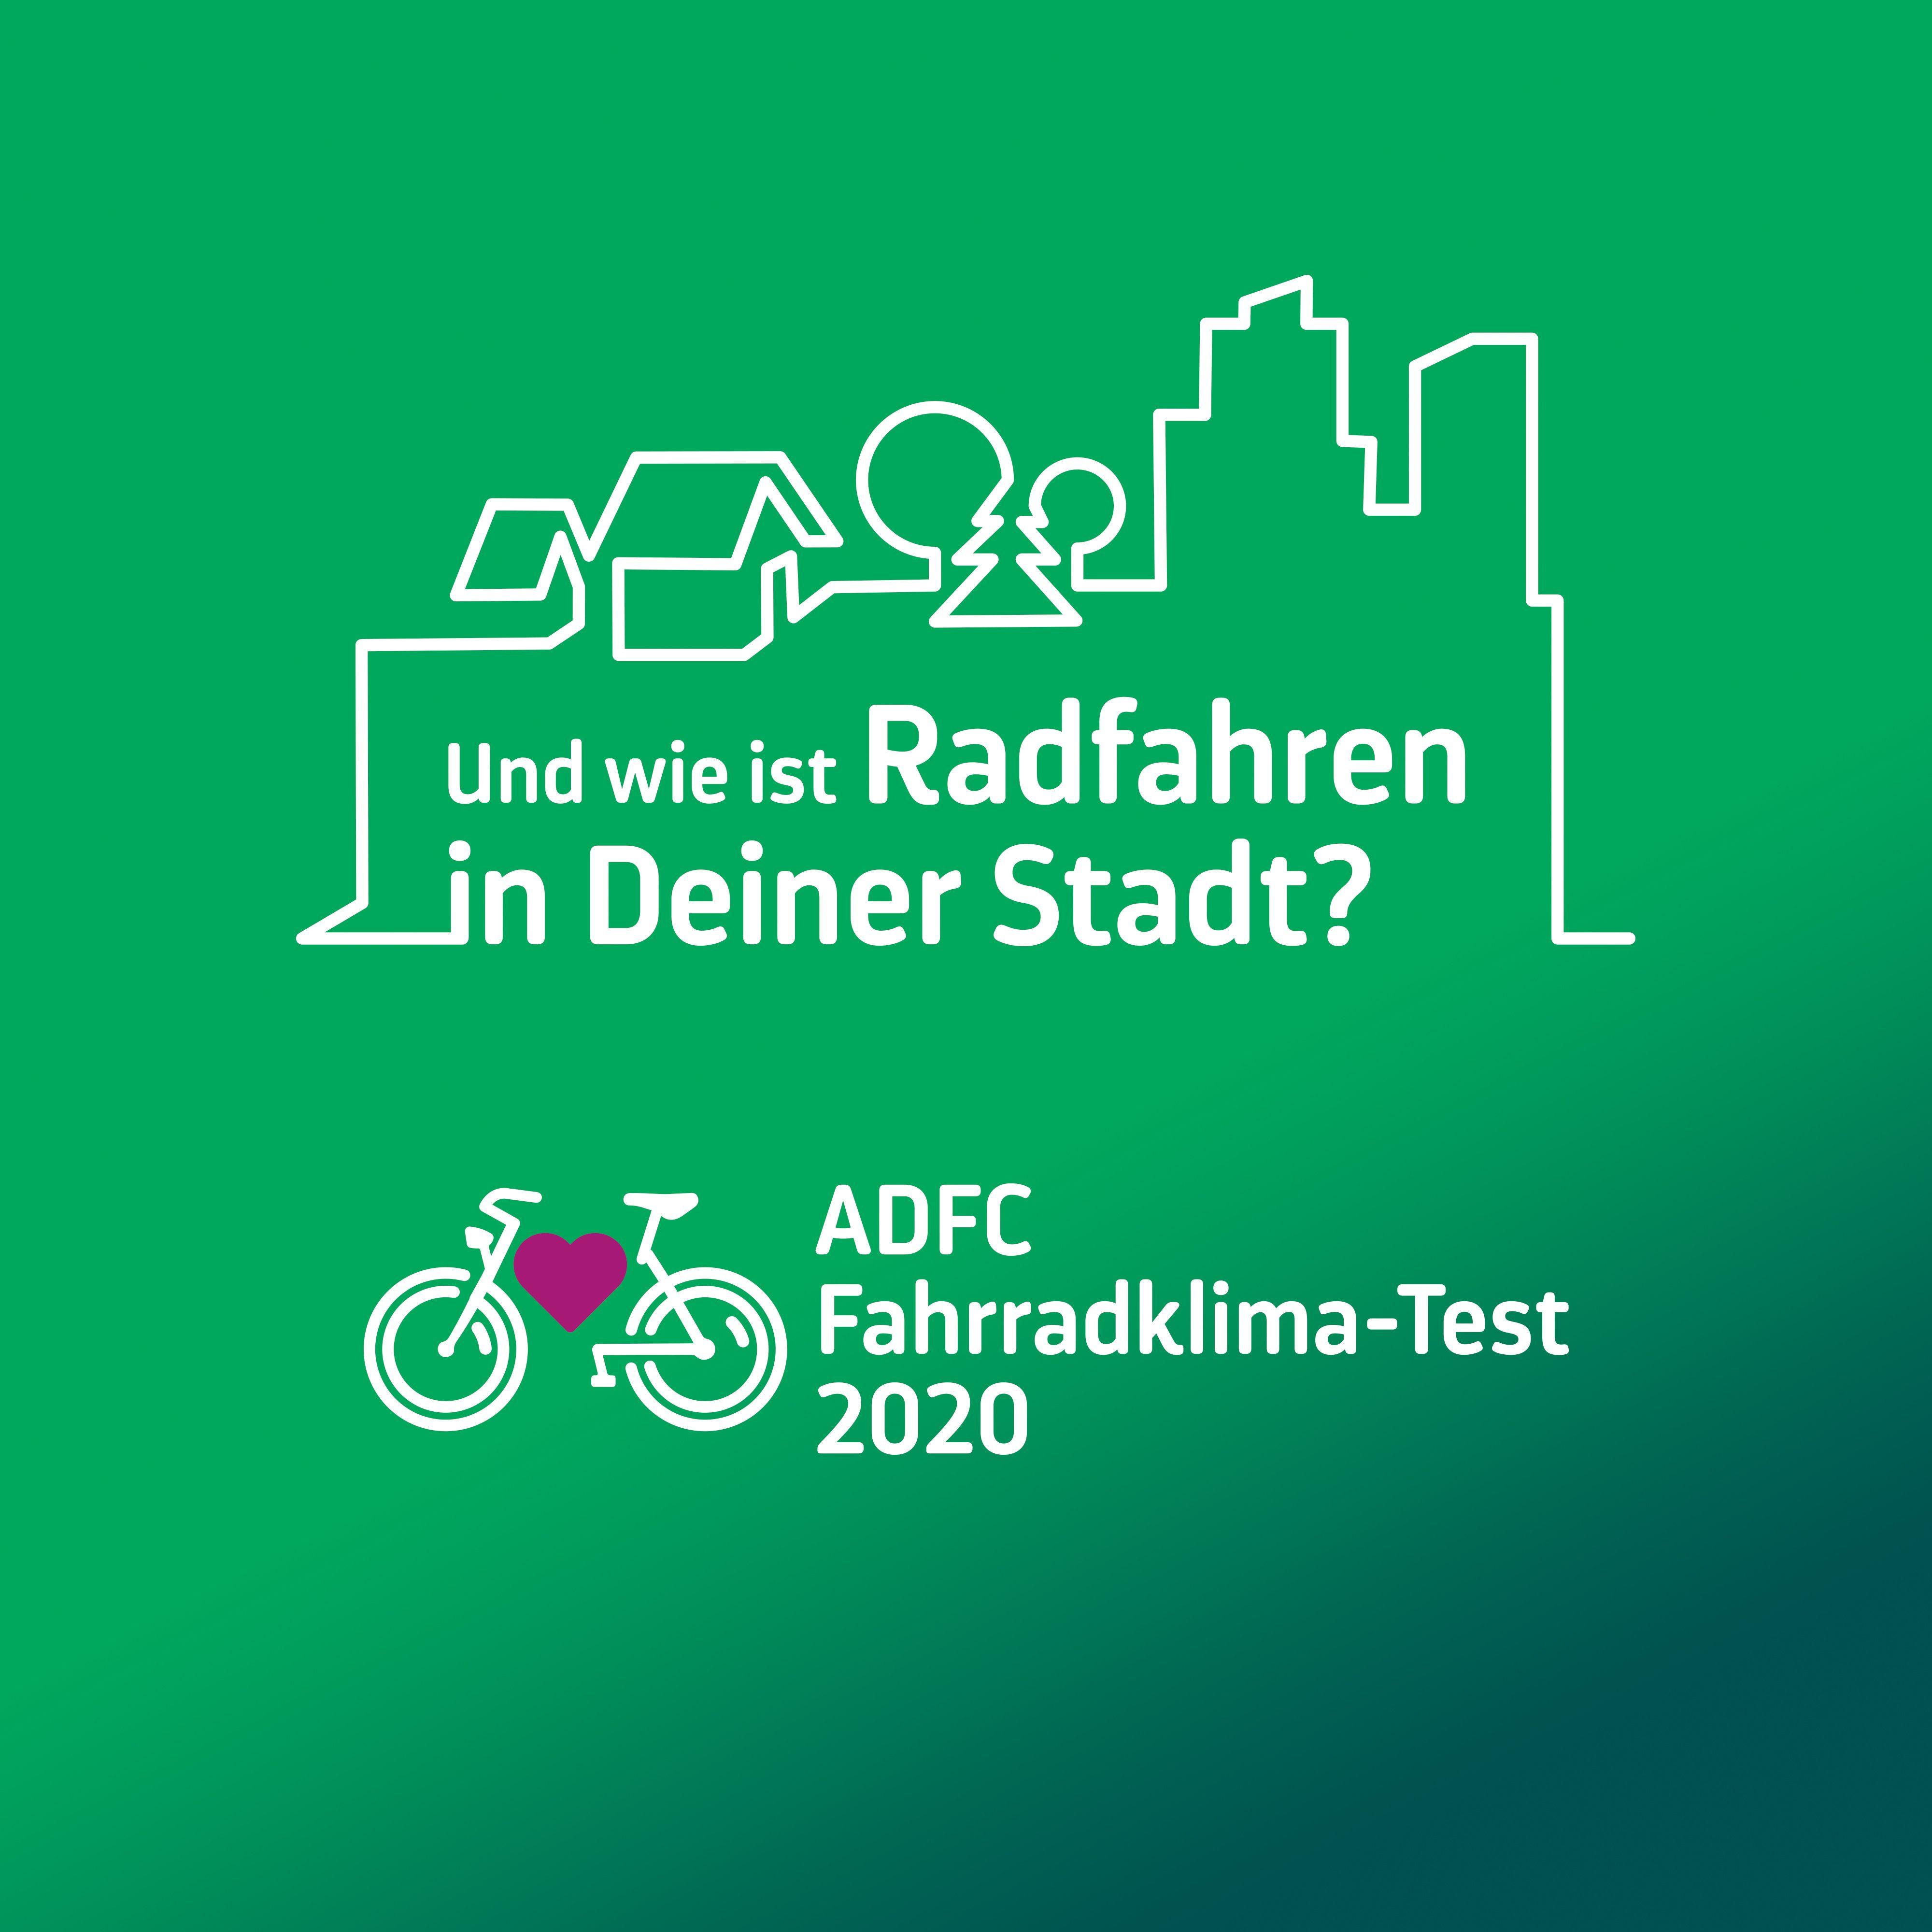 ADFC keyvisual